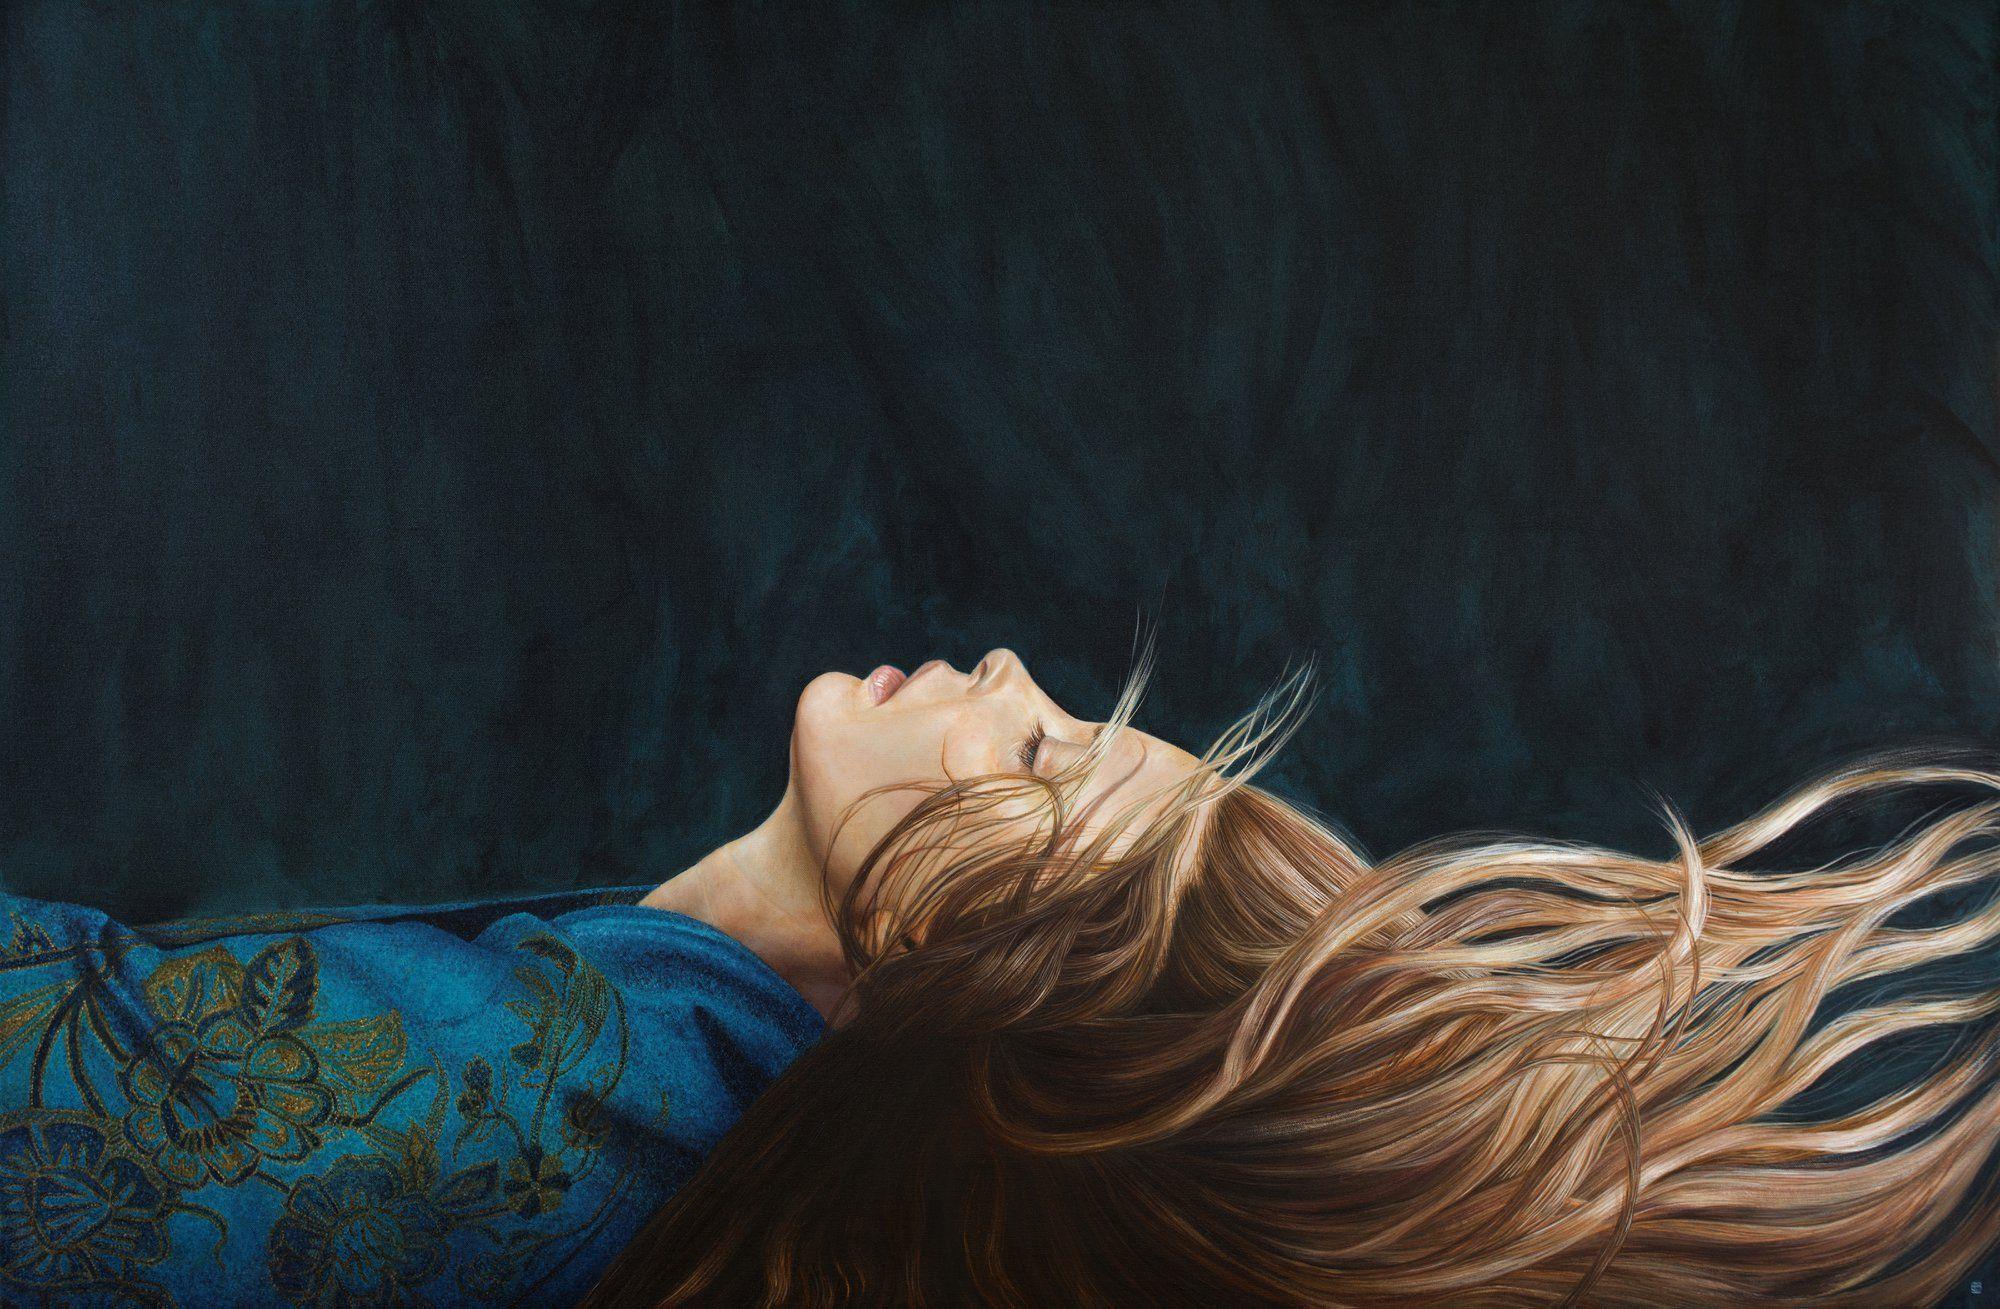 Pin by Randy McDevitt on Art I Like Beauty, David wells